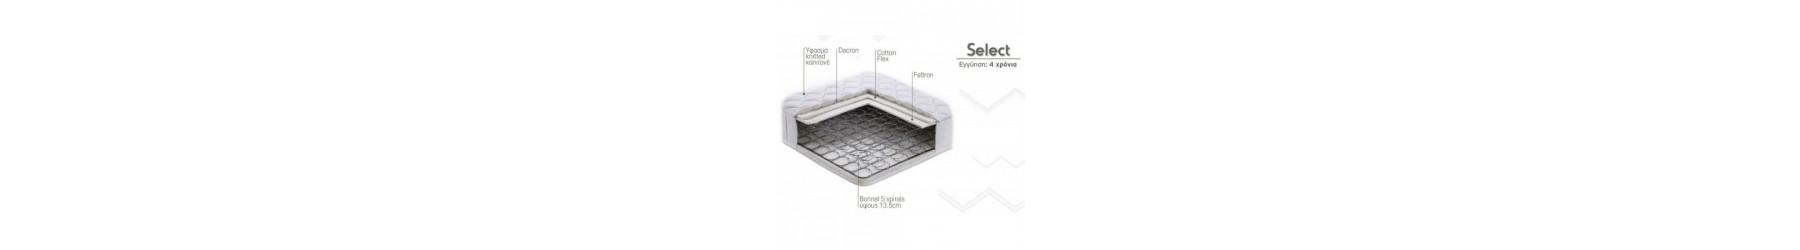 SELECT Στρώματα με ανατομικό και ορθοπεδικό σχεδιασμό